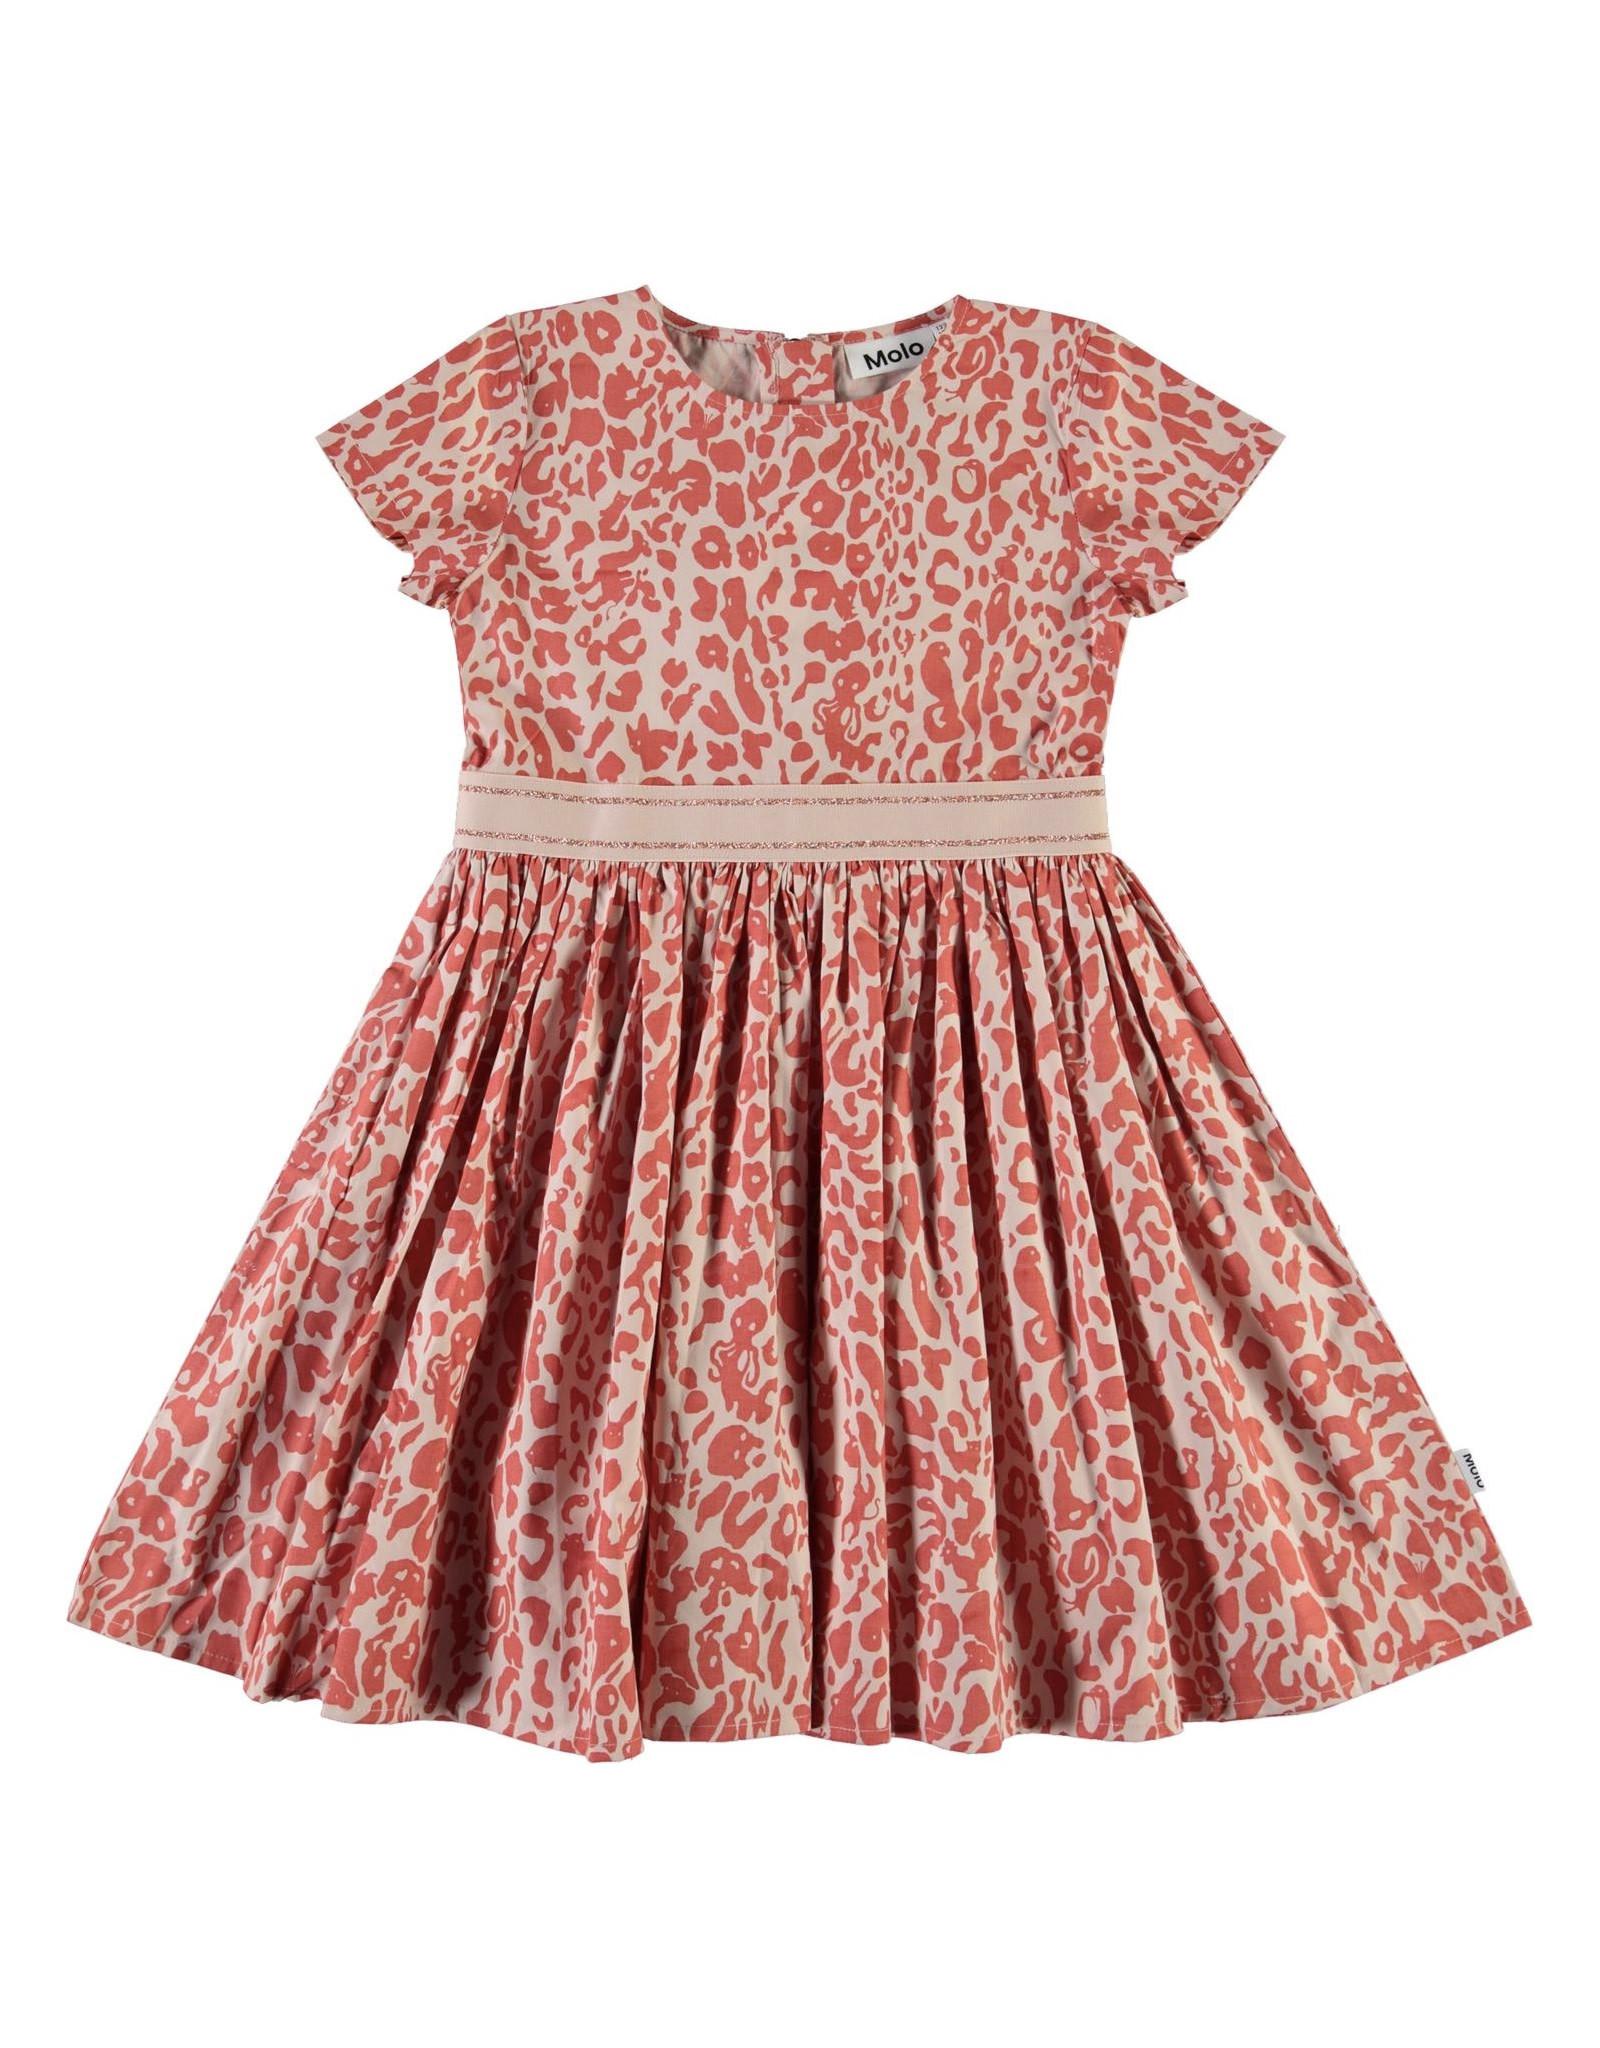 Molo Candy Rose Leopard Dress